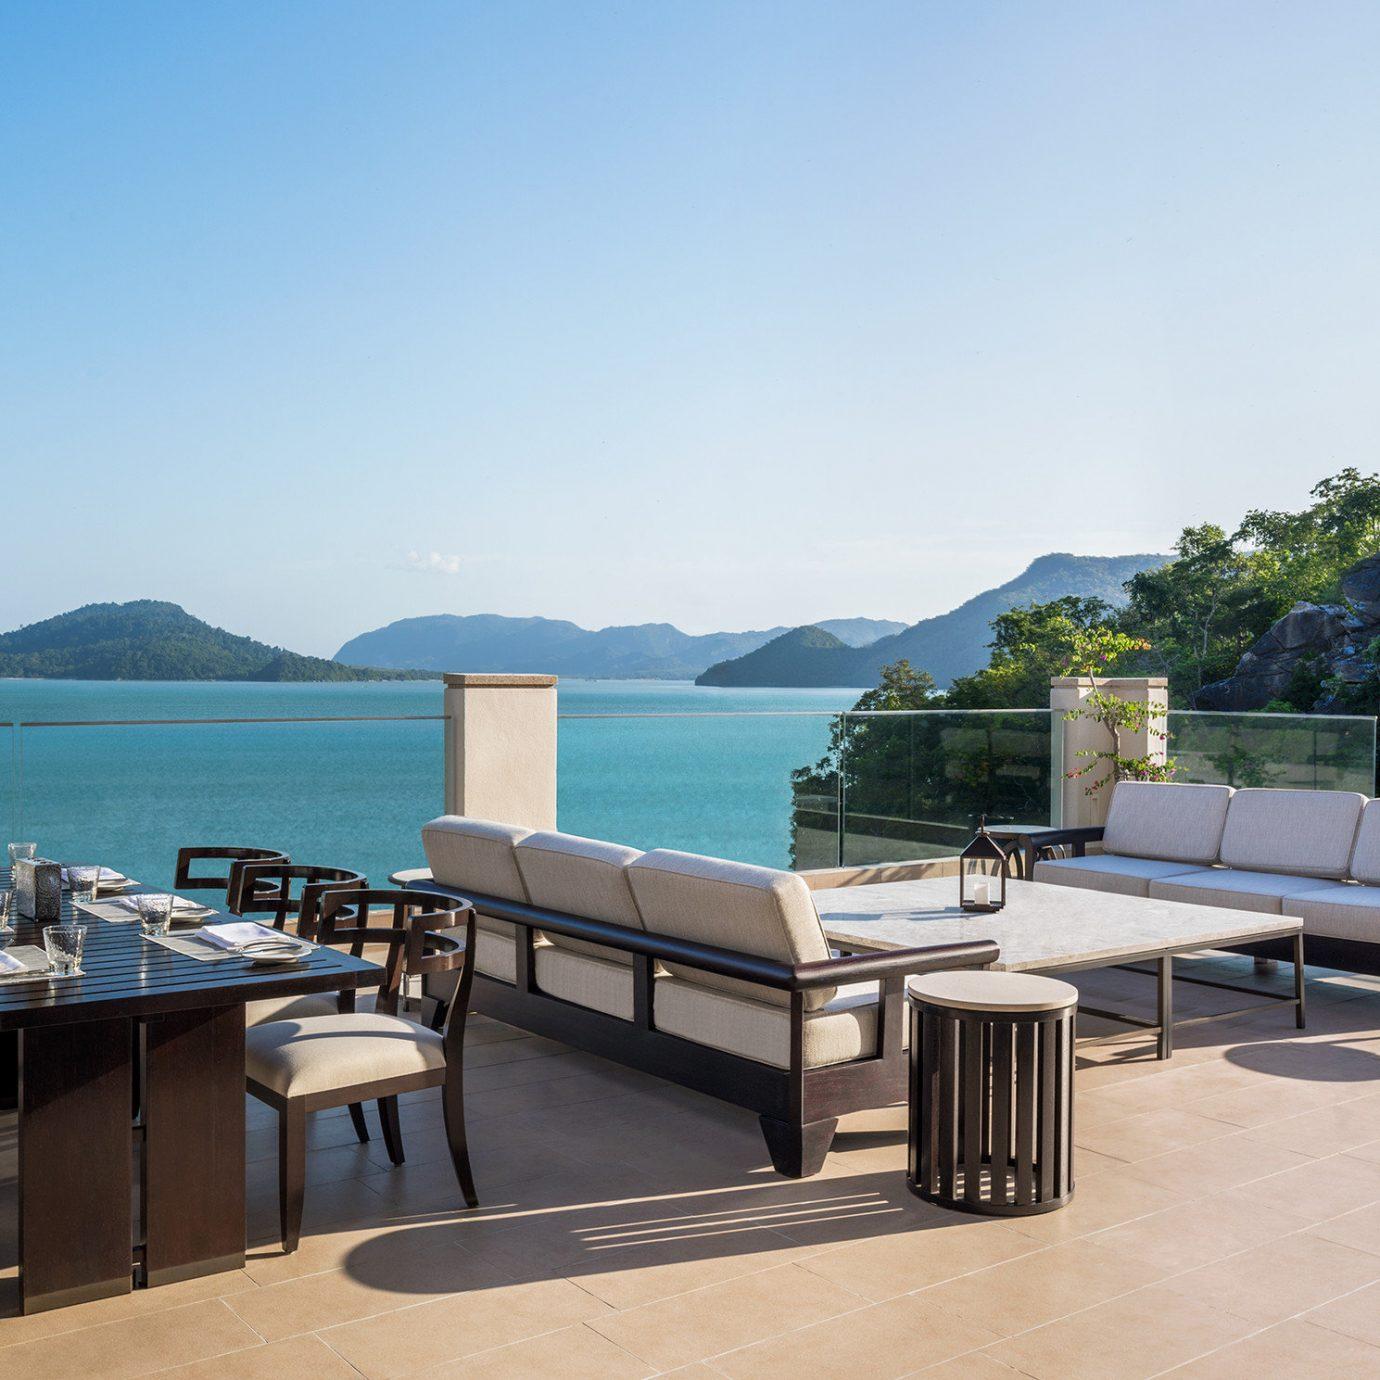 sky leisure property dock marina Resort Villa vehicle overlooking day